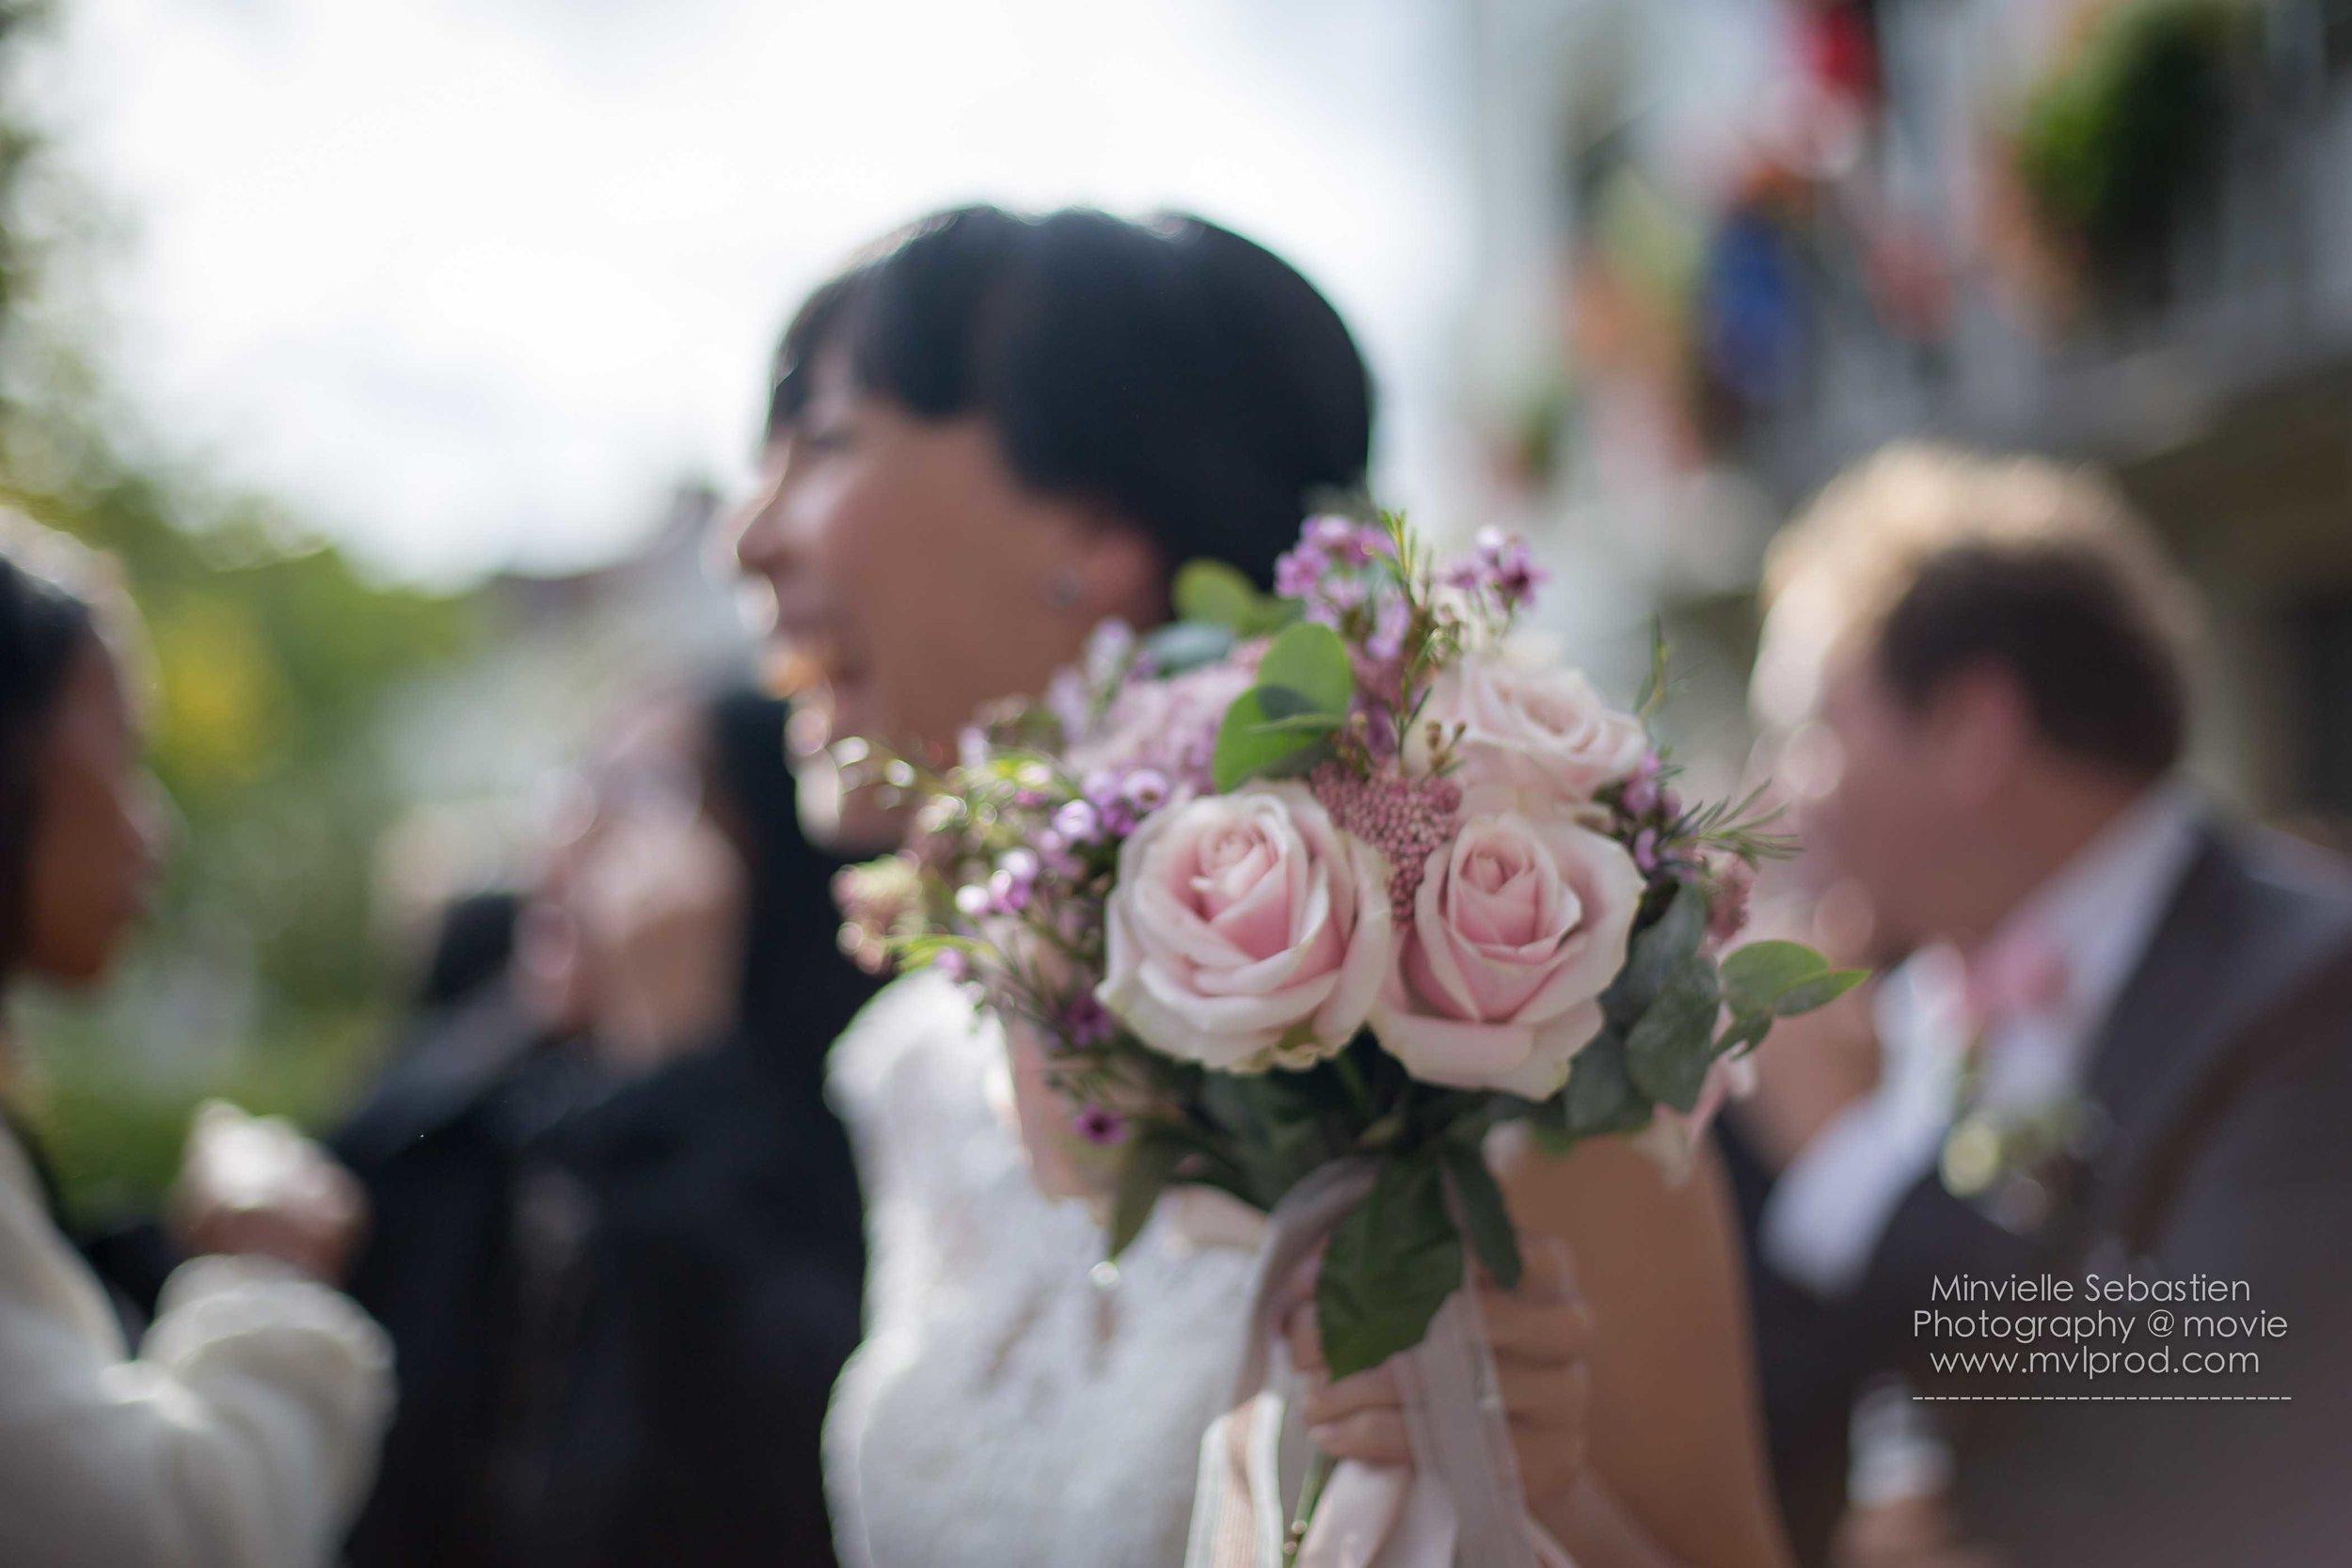 decoration-mariage-decoration-mariageIMG_4009.jpg